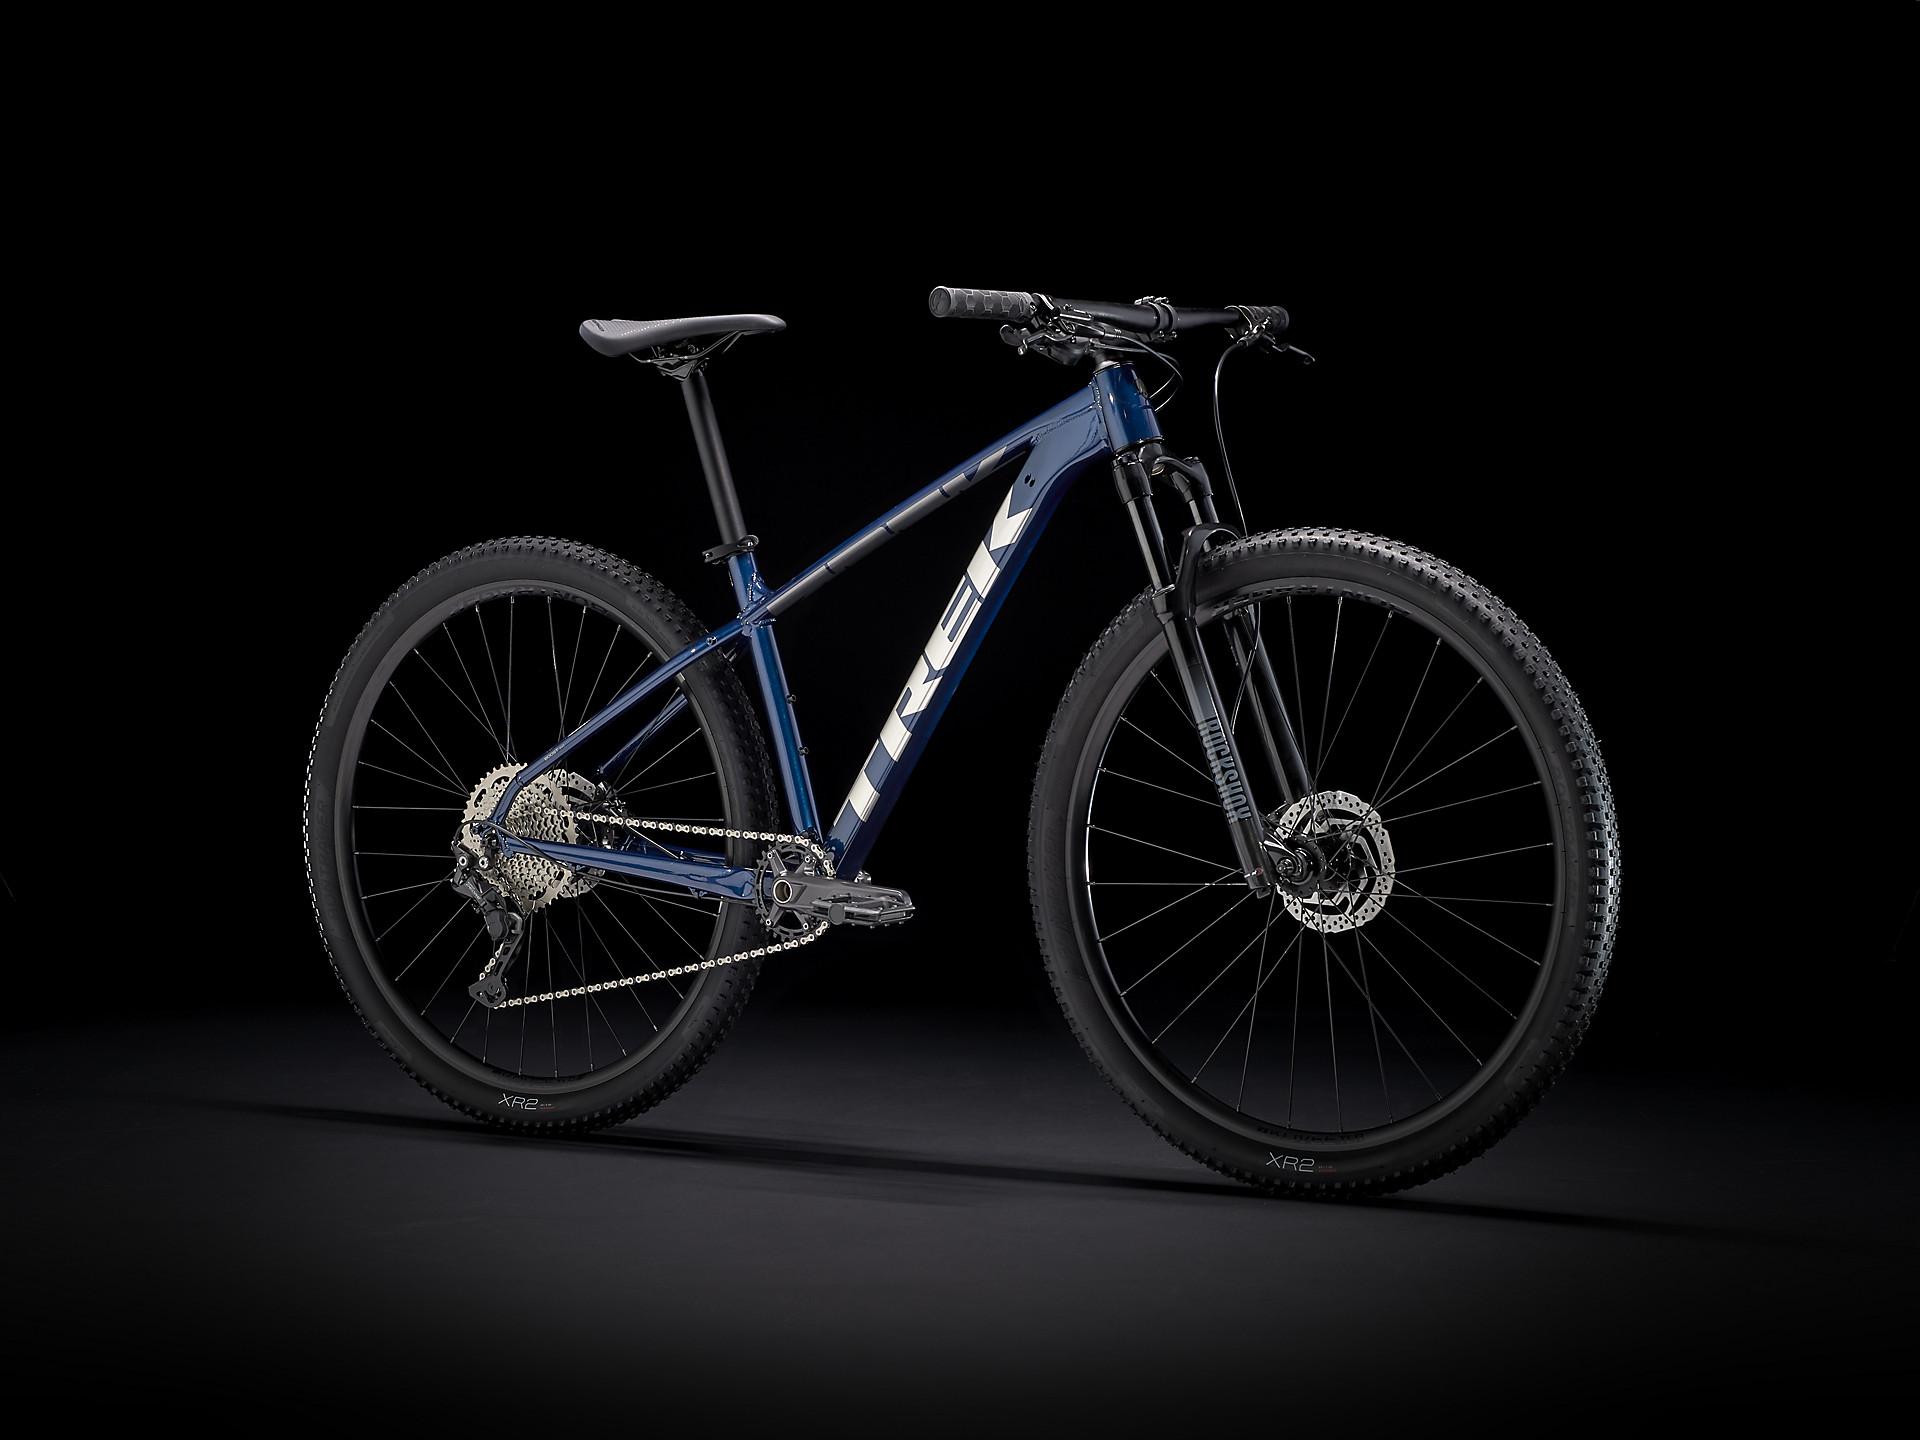 Trek X-Caliber 7 Hardtail Mountain Bike